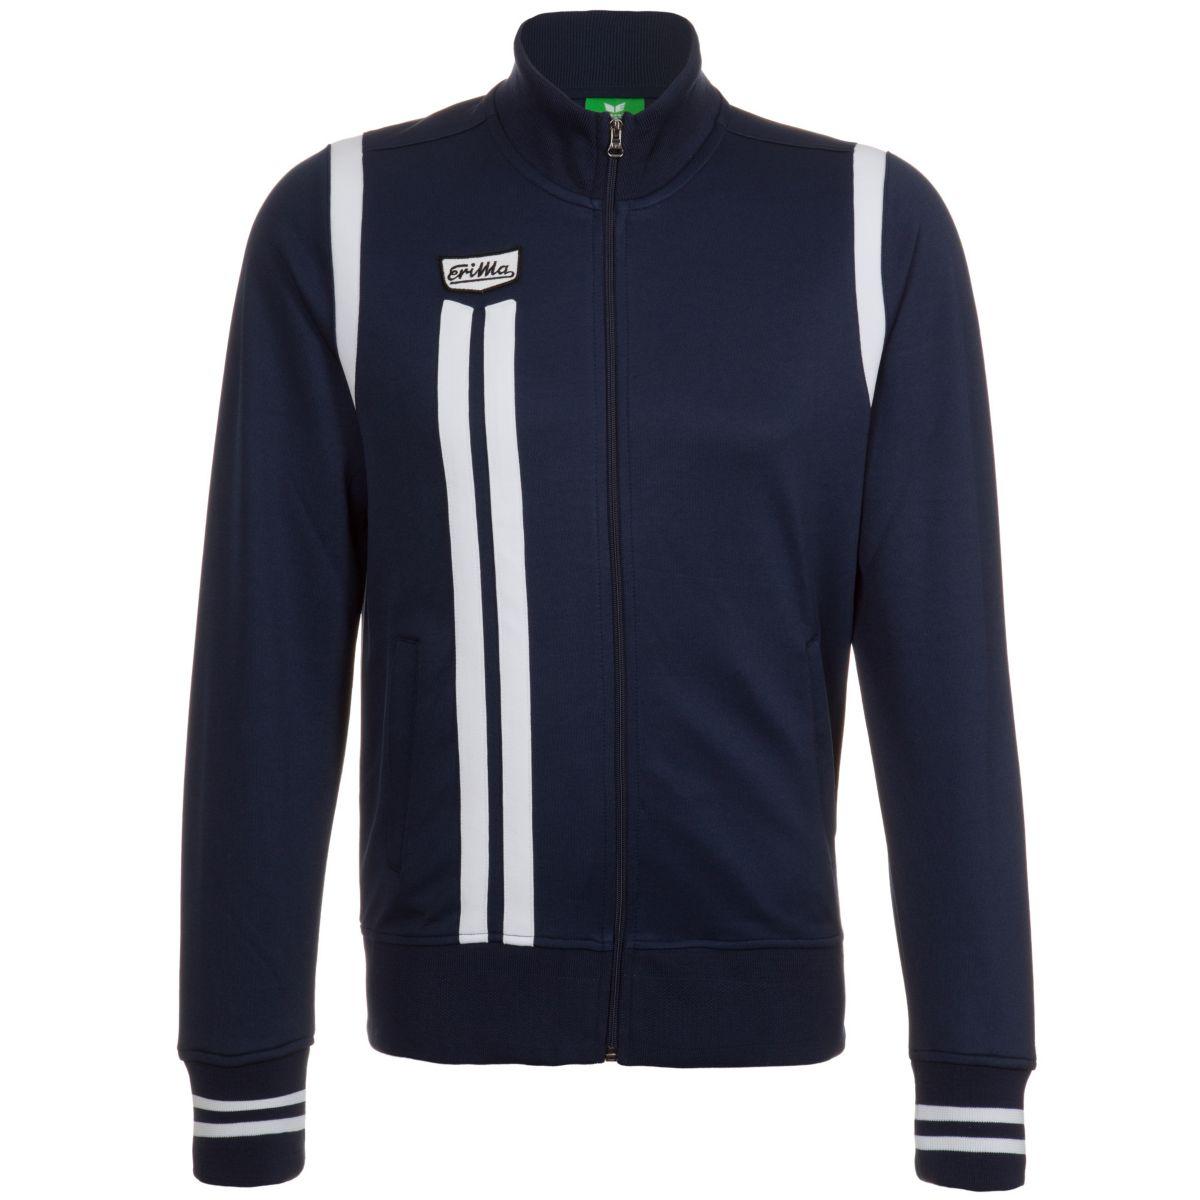 exklusiv Kapuze Reißverschluss mit Jacken Adidas e Leinen FZ